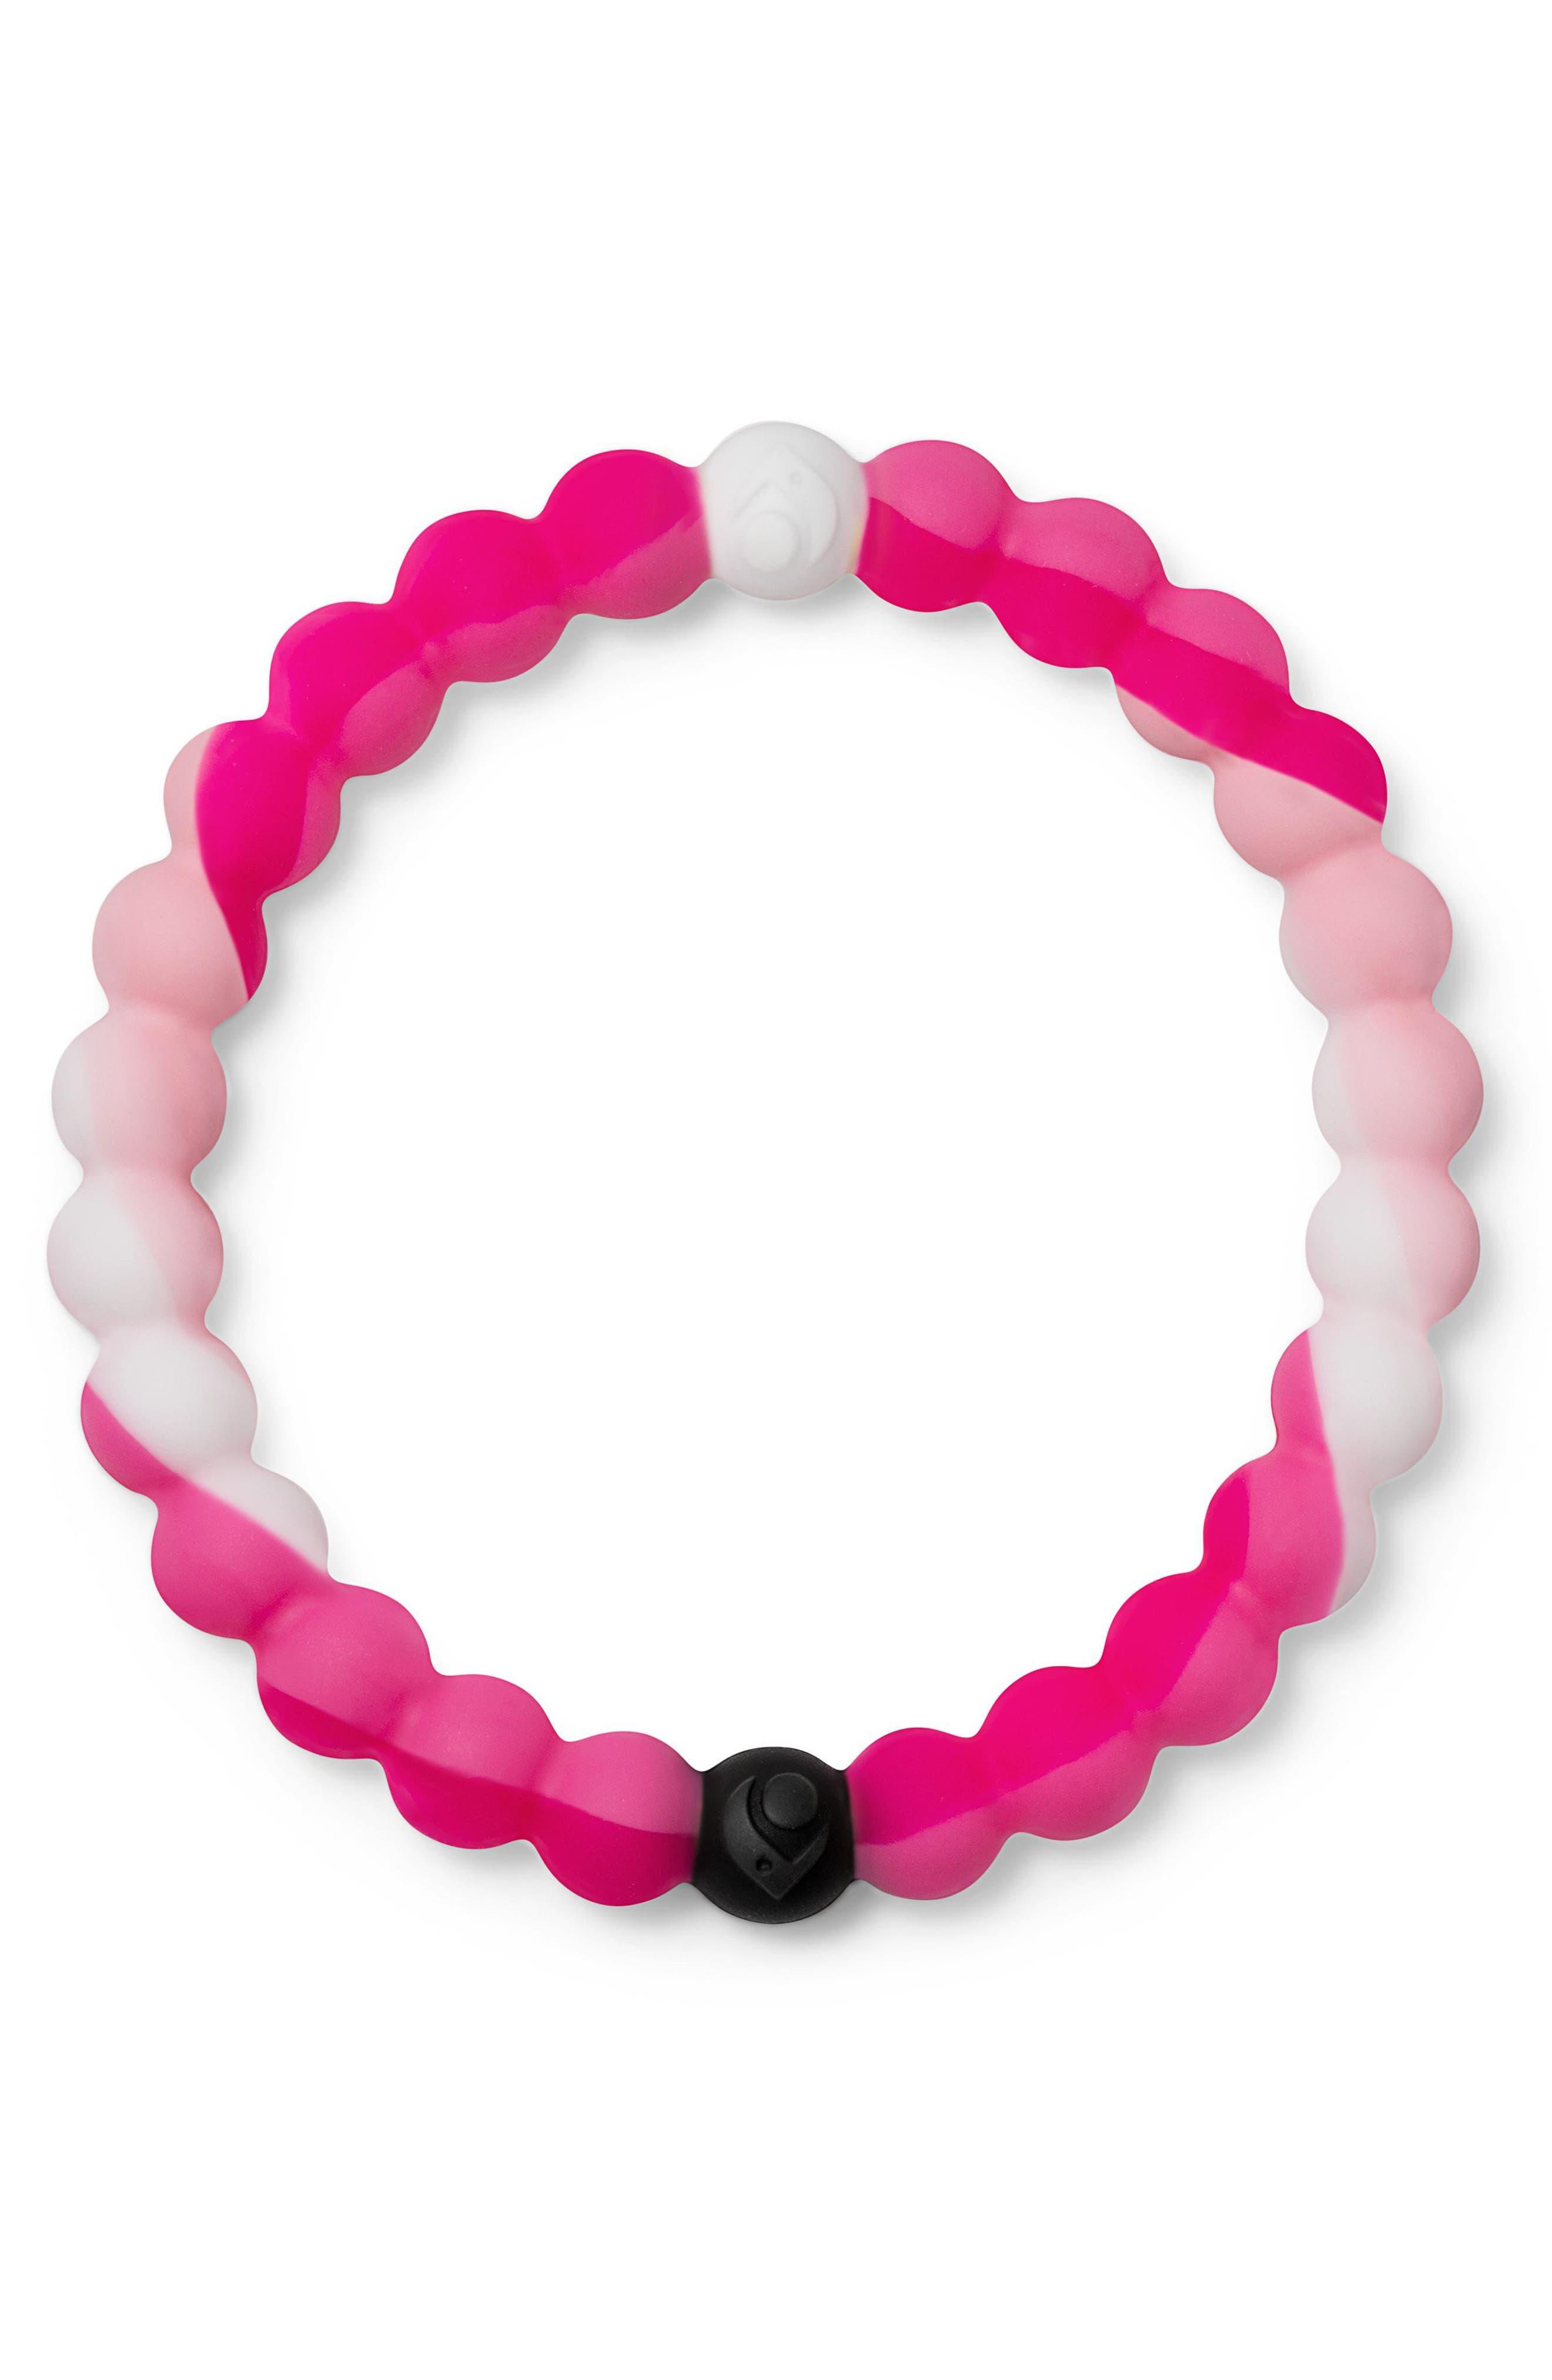 Lokai Limited Edition Pink Bracelet